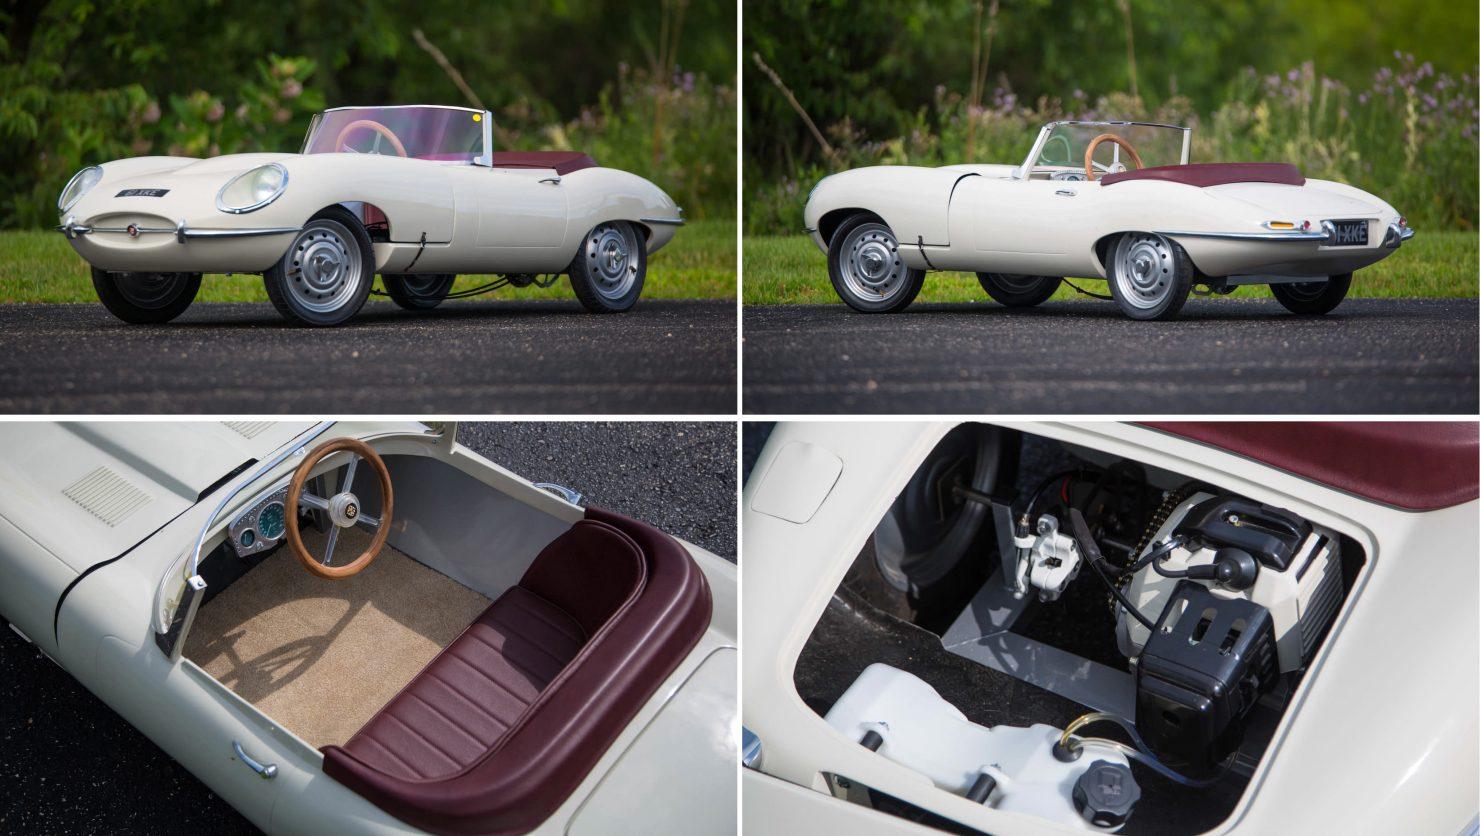 Jaguar E Type Go Kart Collage 1480x836 - Classic Car Go Karts